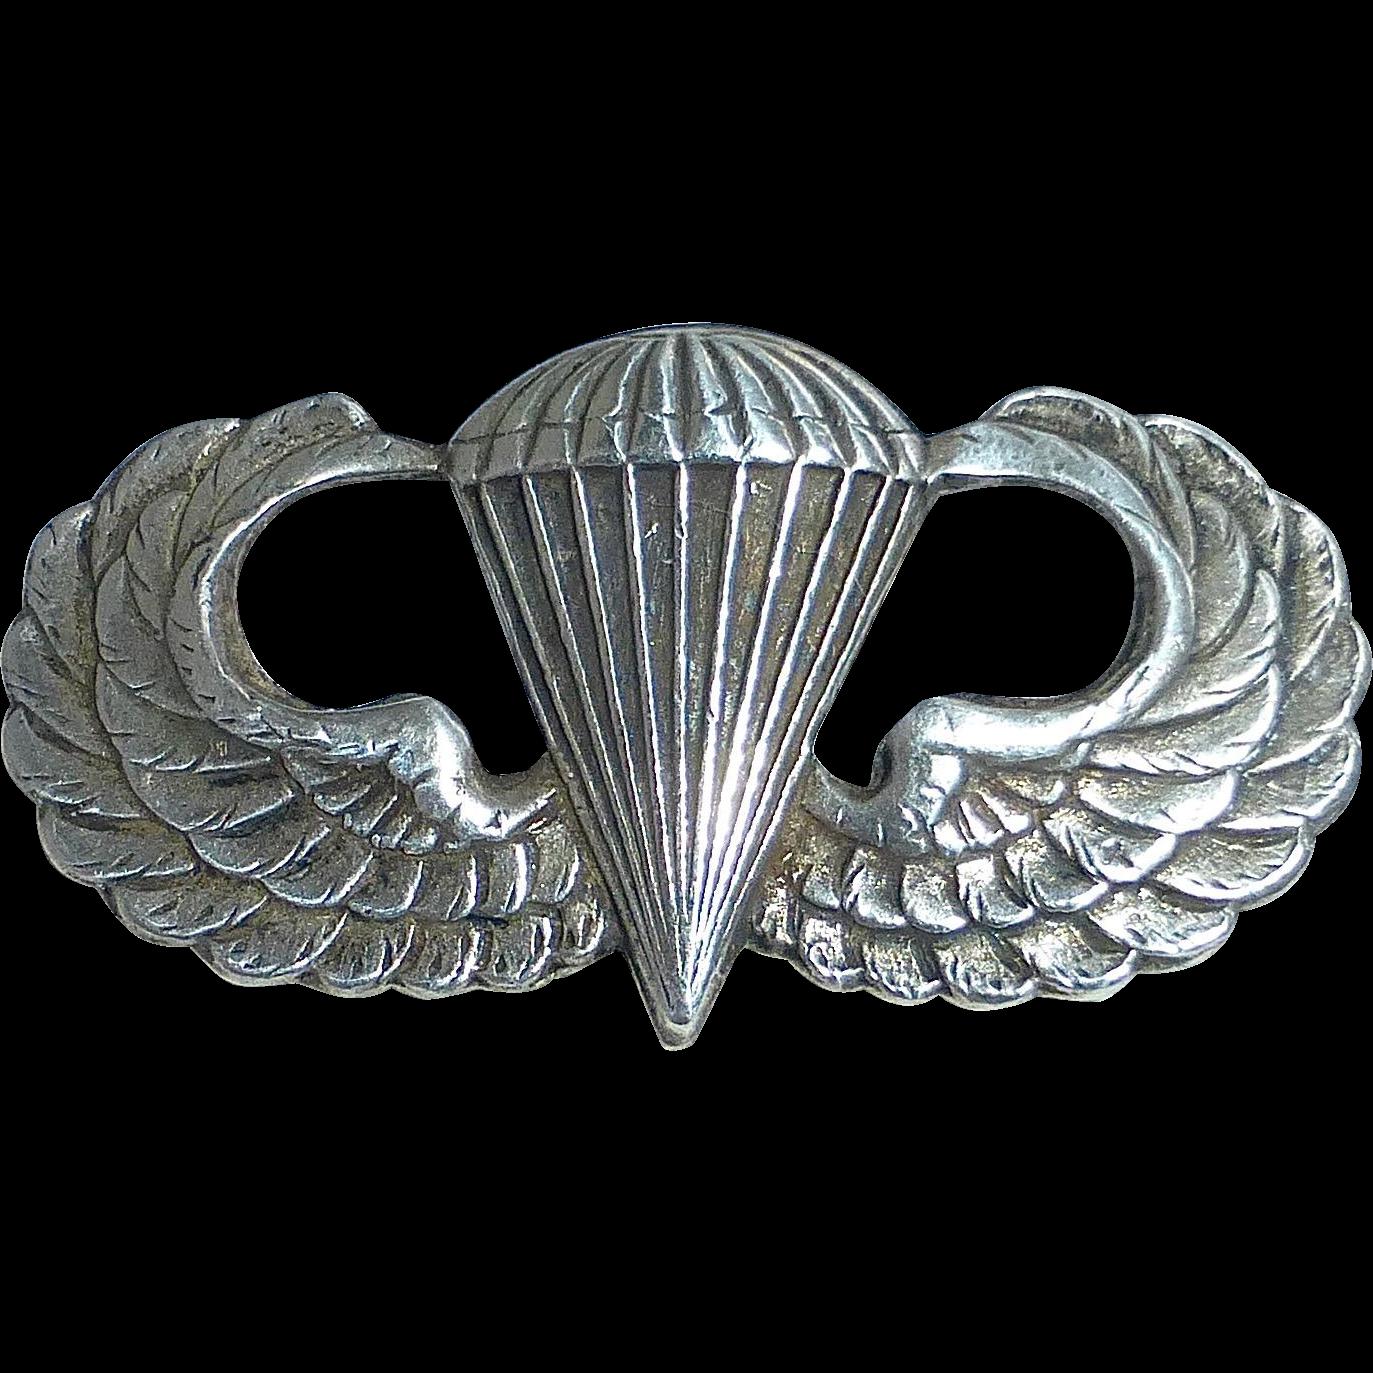 PAIR US ARMY AIRBORNE PARACHUTIST JUMP WINGS BADGE UNIFORM INSIGNIA PIN